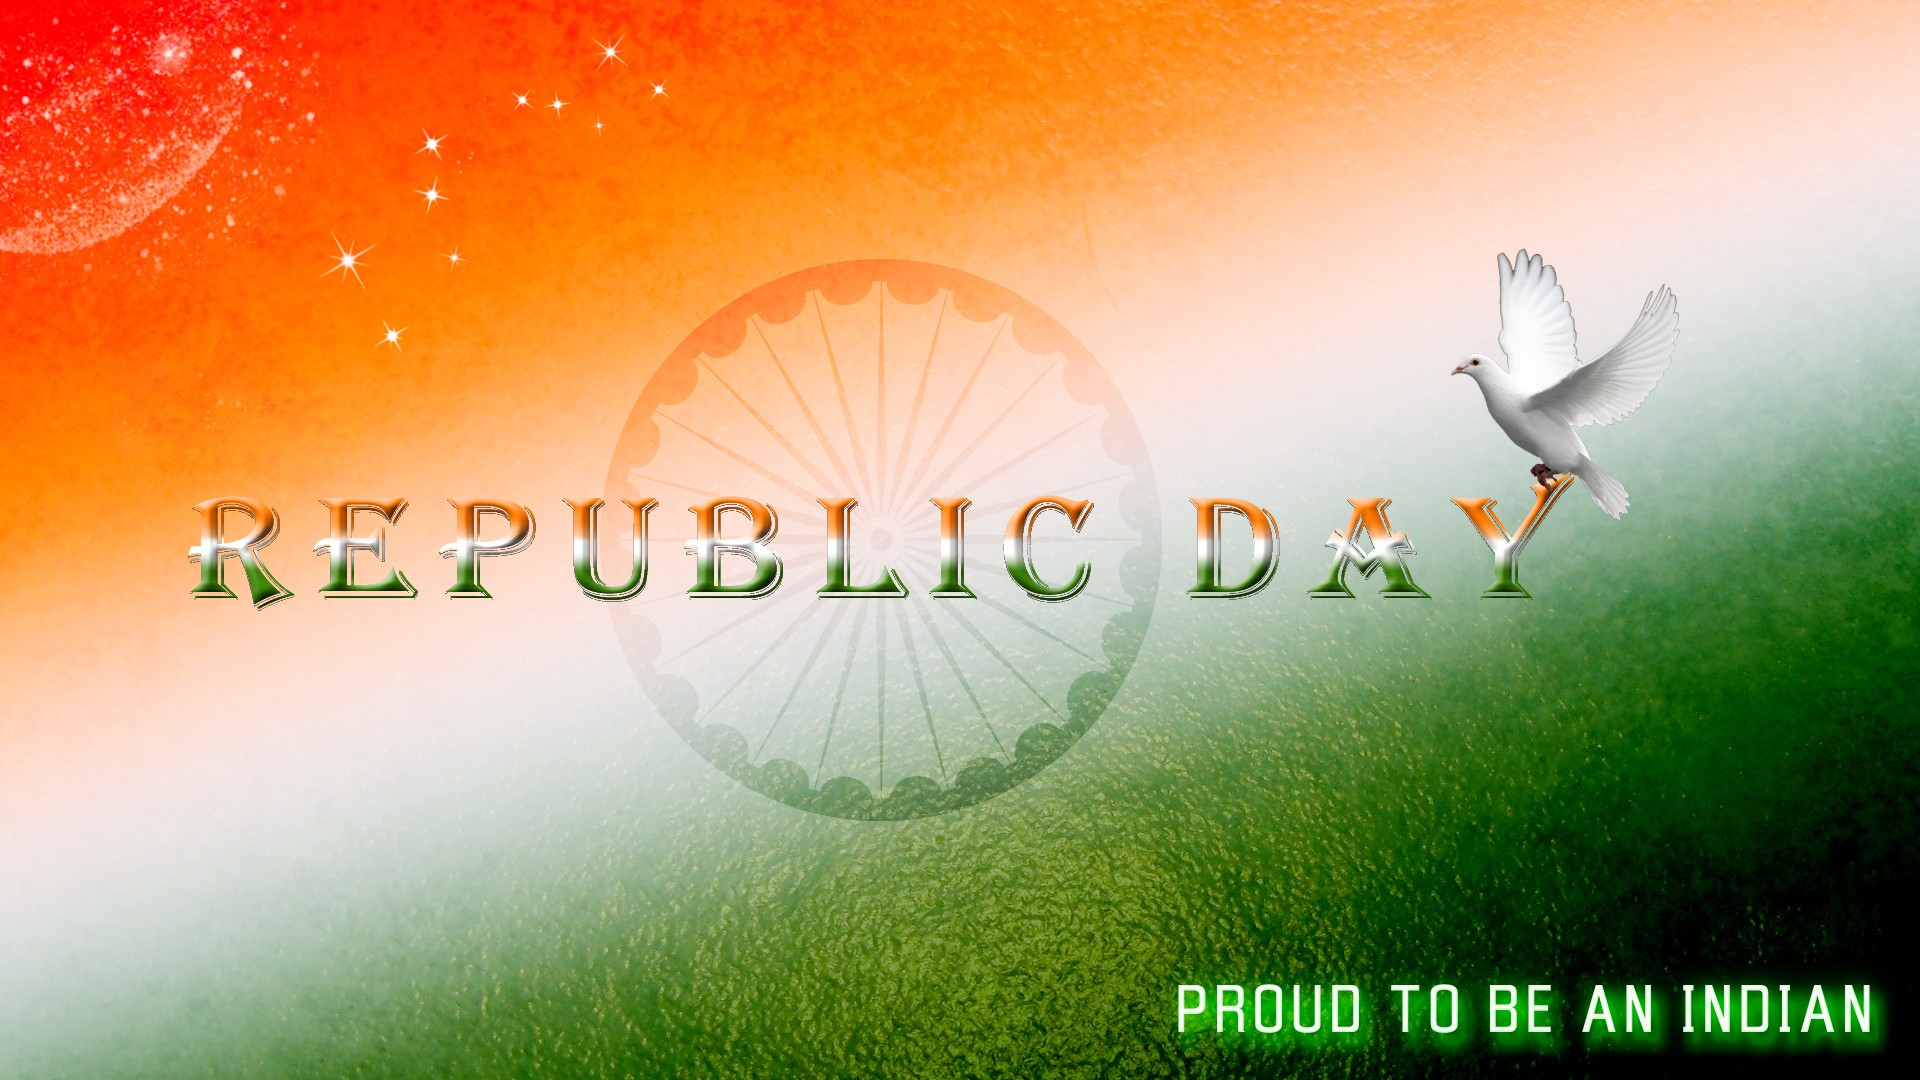 26 Jan Republic Day Hd Images Wallpaper   Full Hd 26 January 1920x1080